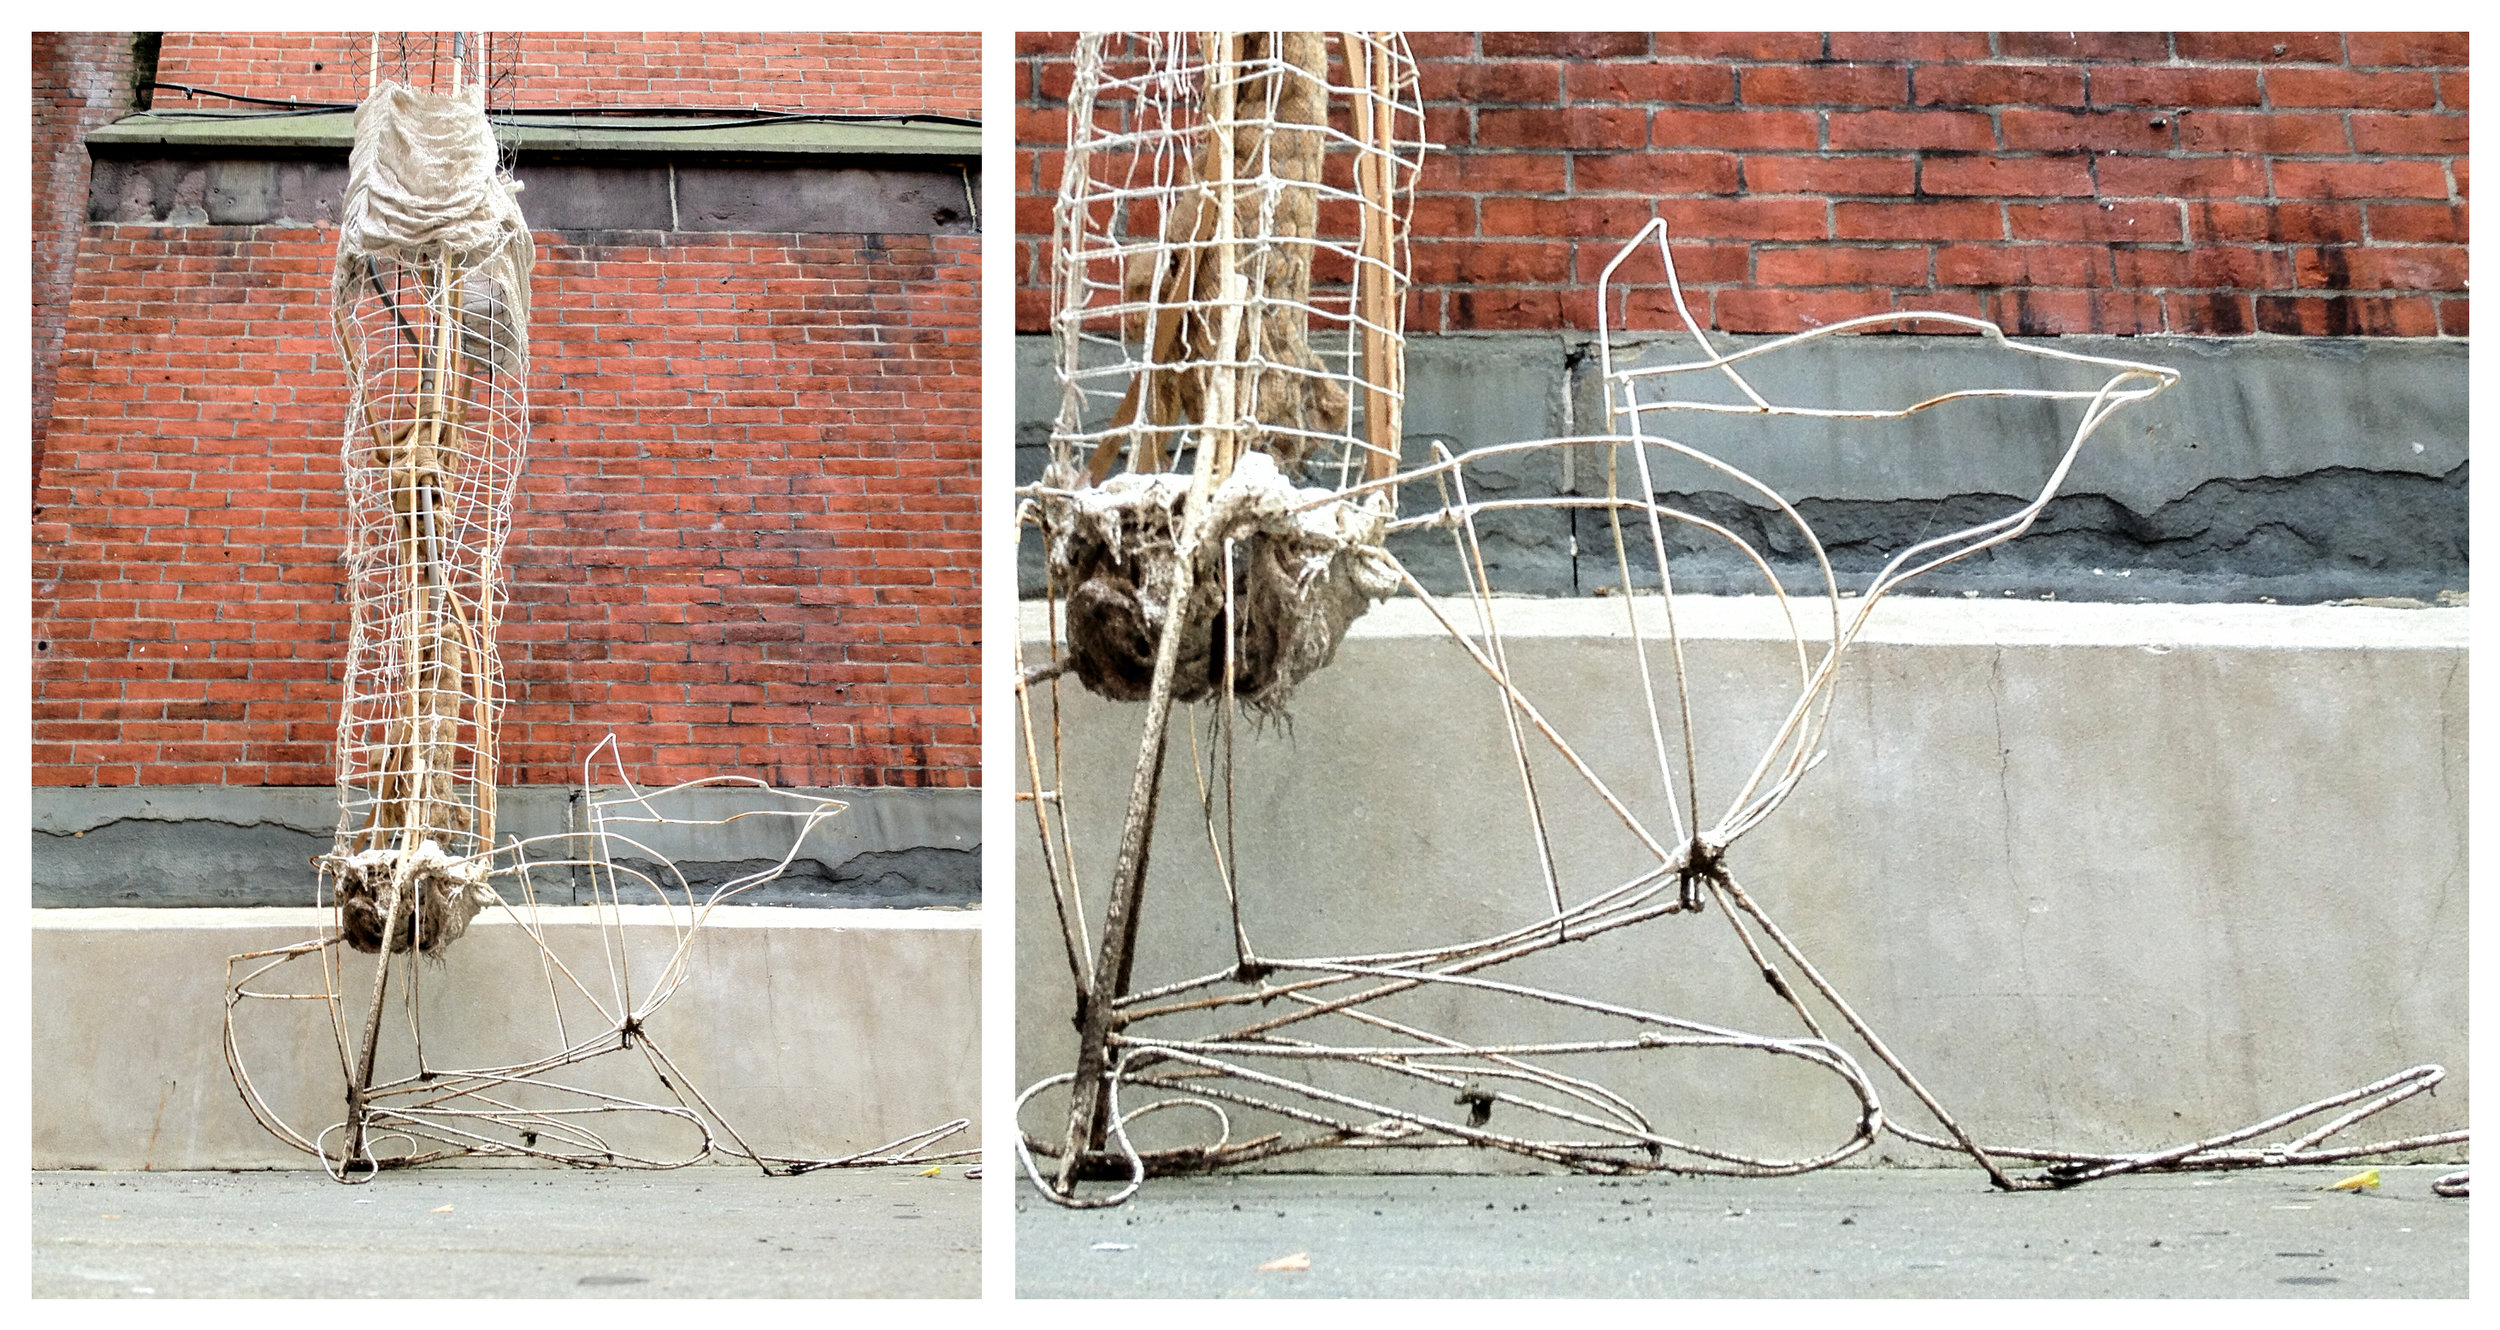 2012-04-15 005 human bull frog copy.jpg